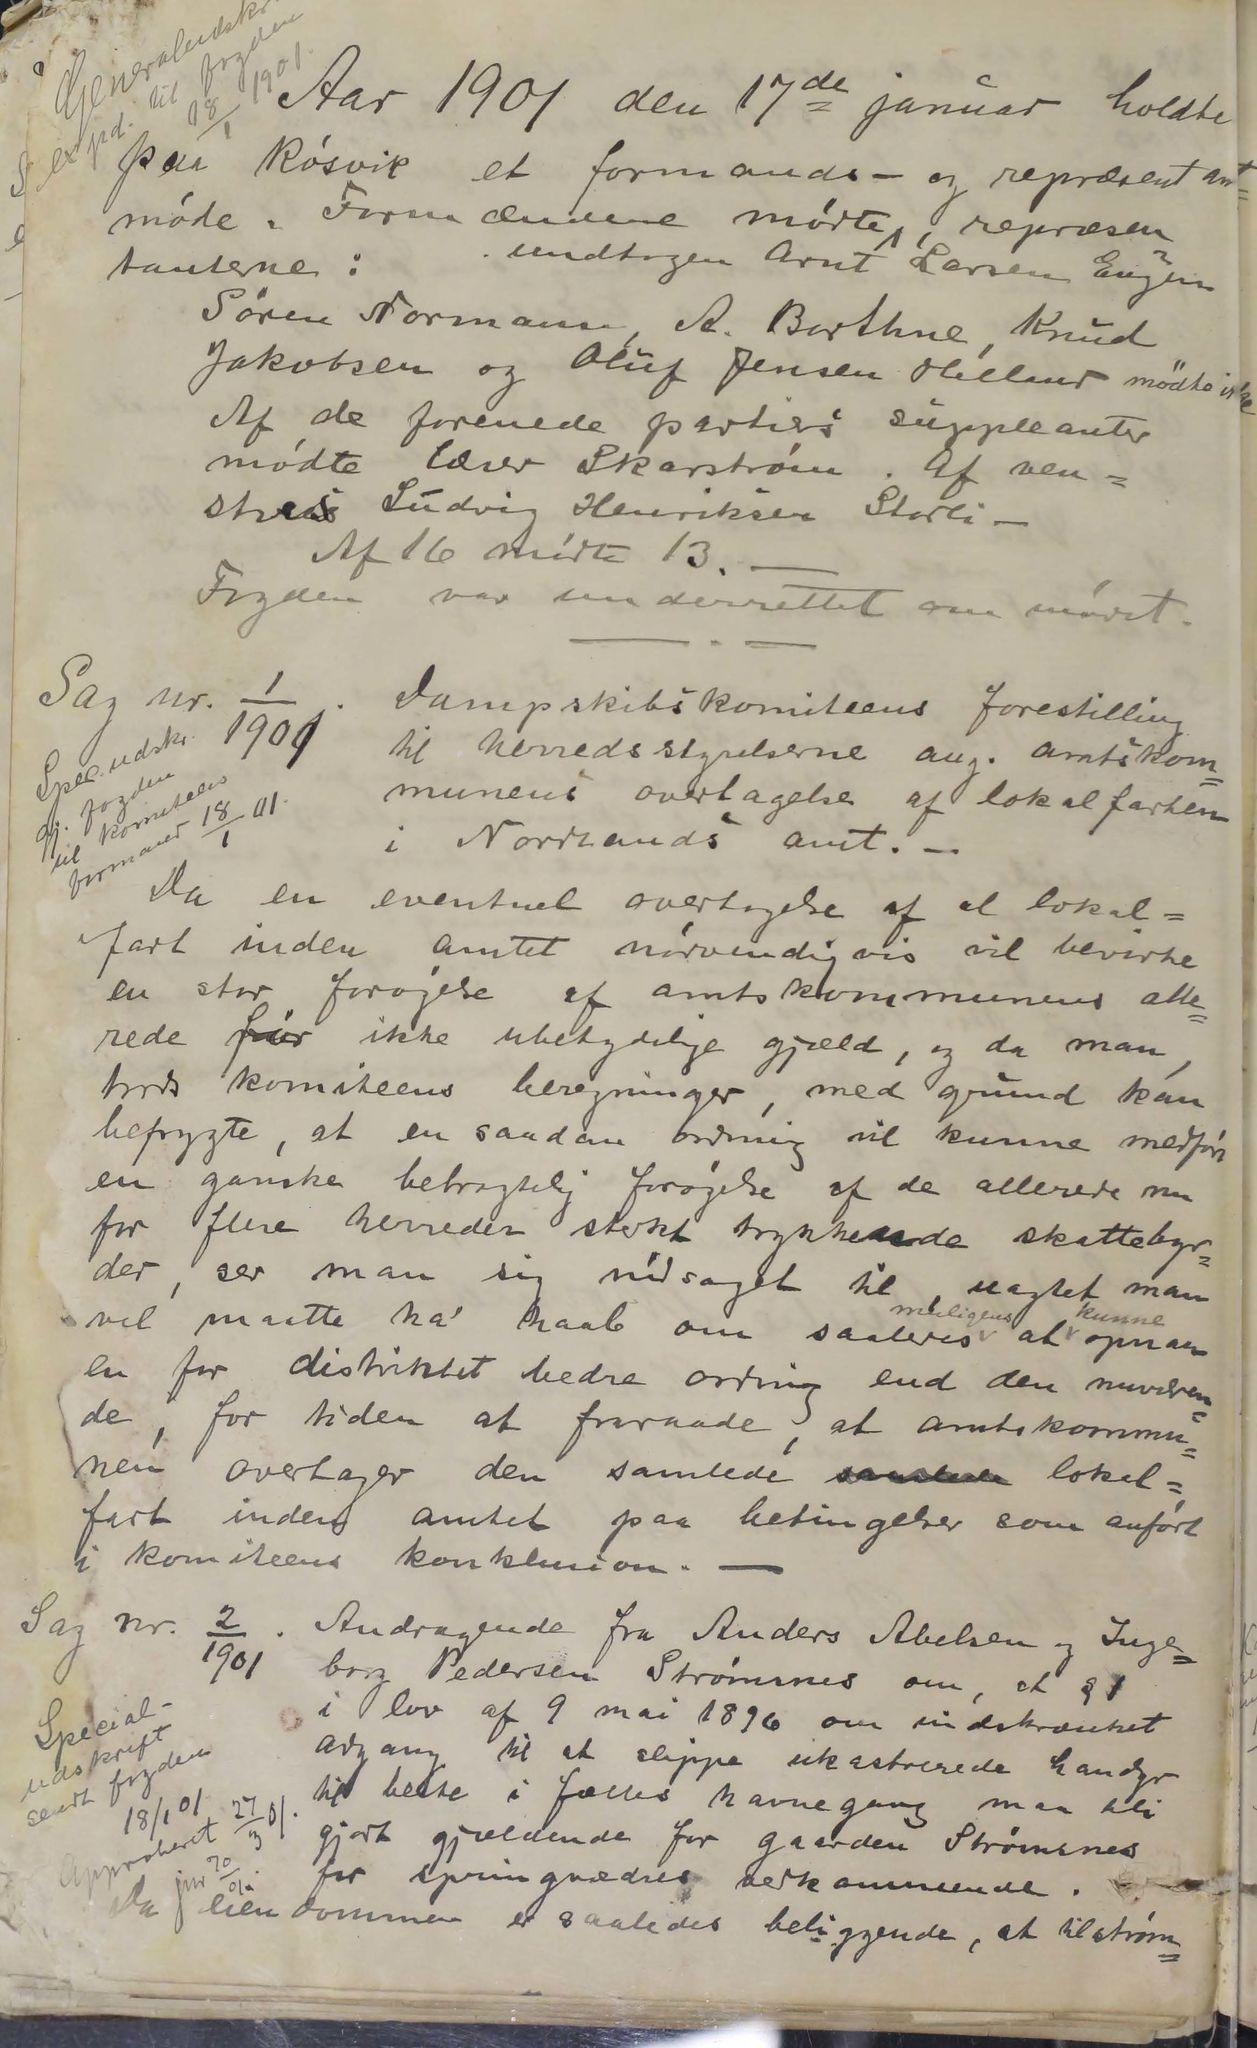 AIN, Sørfold kommune. Formannskap, 100/L0001: Forhandlingsprotokol for Sørfoldens formandskab, 1885-1902